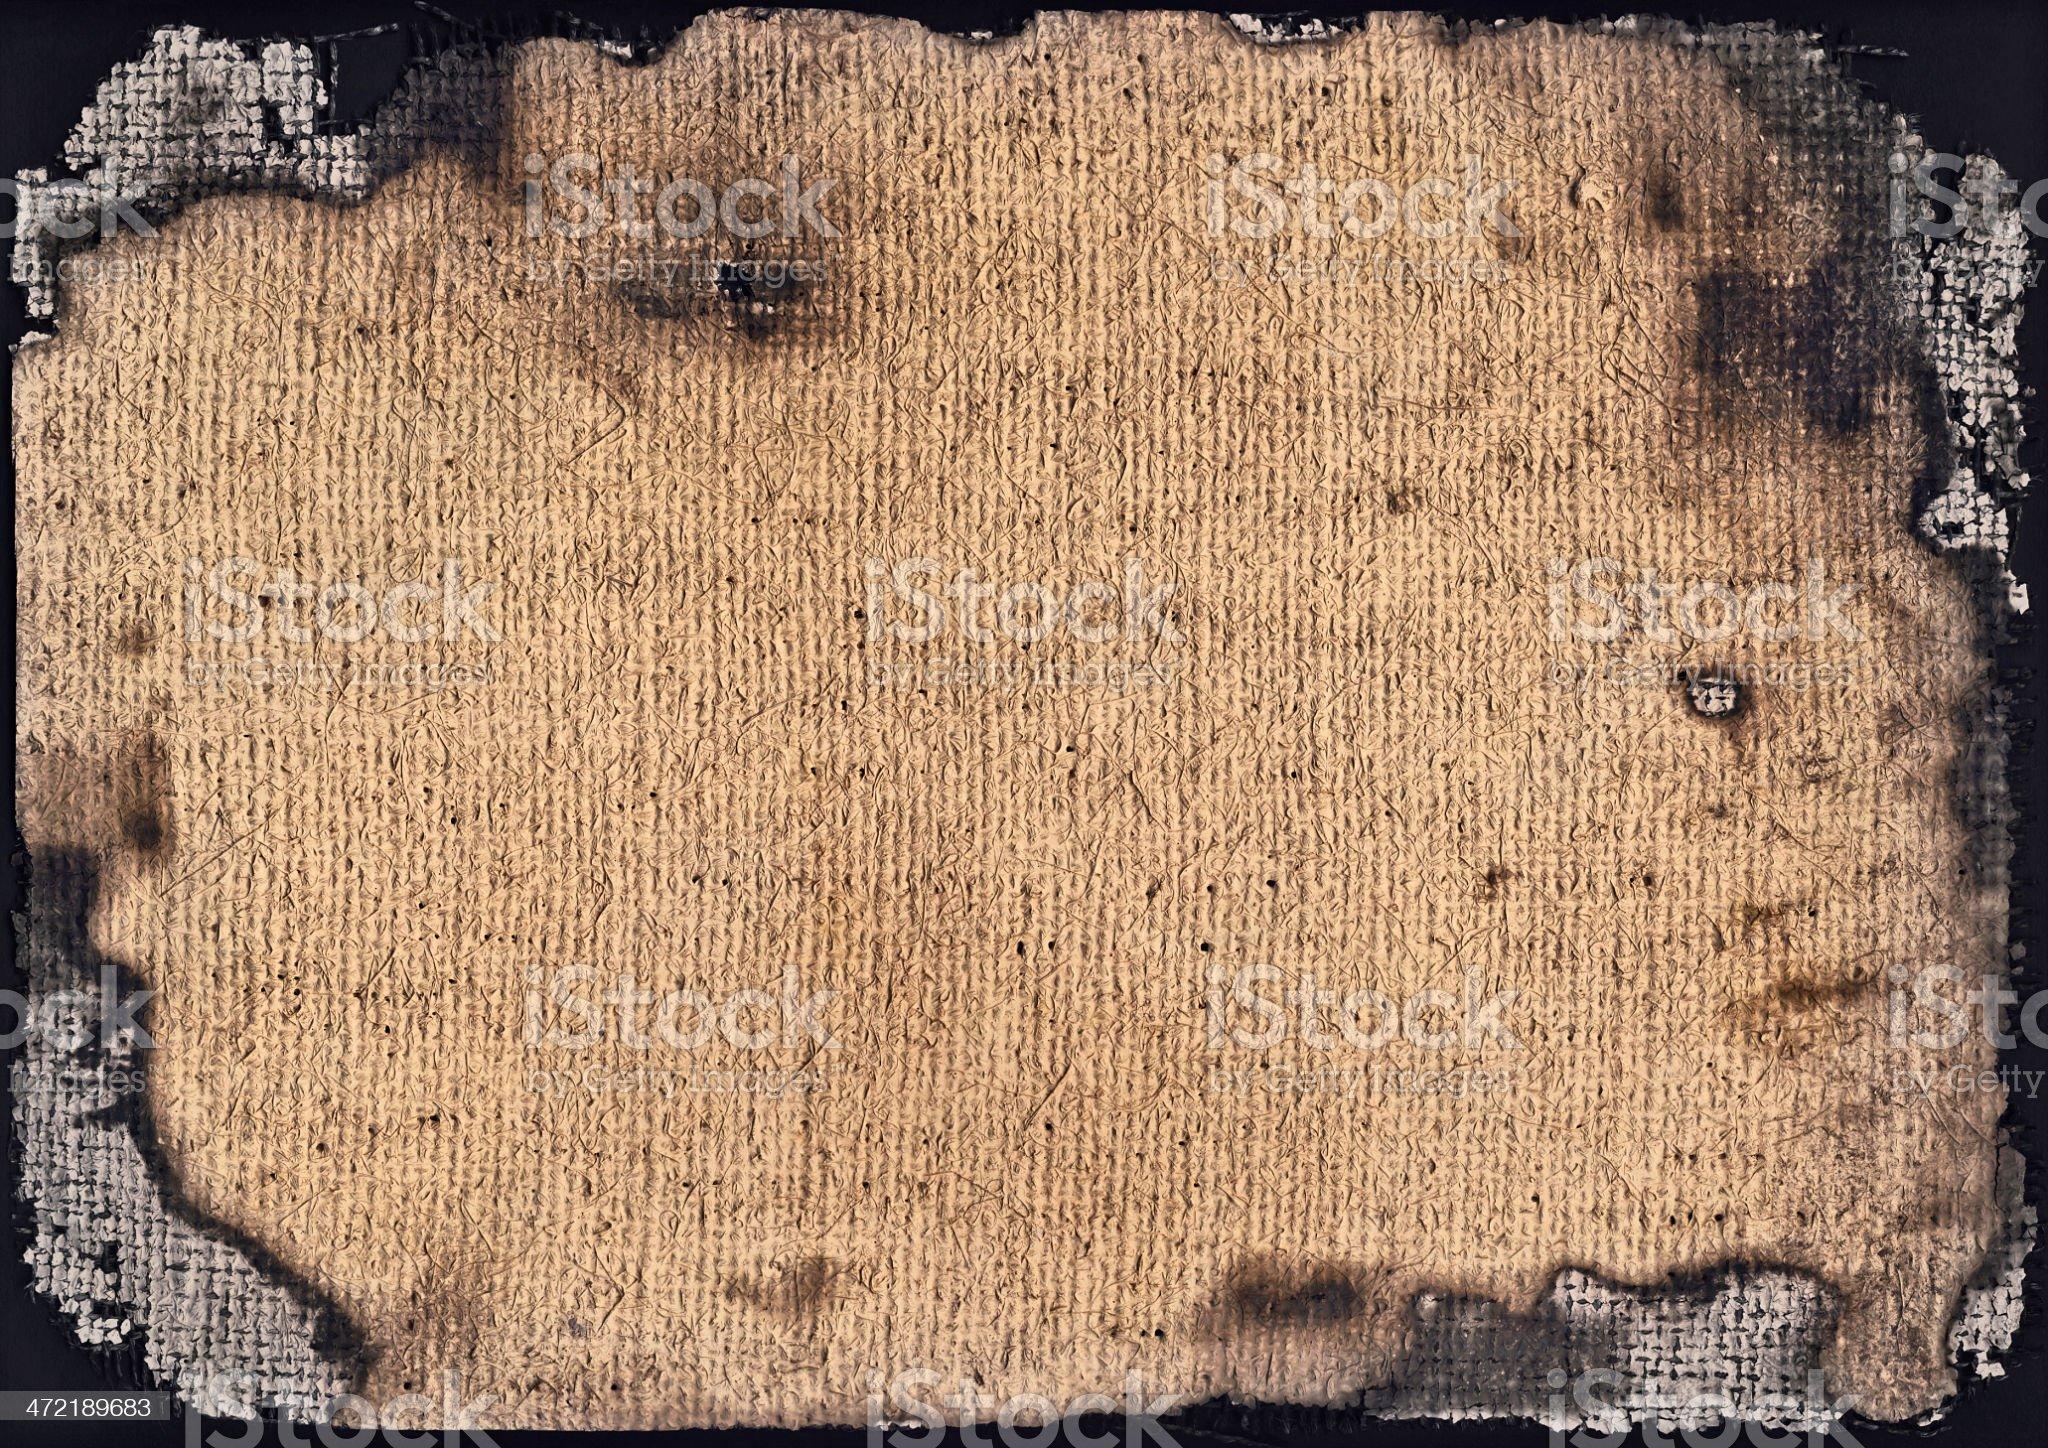 Artist Burlap Canvas Burnt Vignette Grunge Texture royalty-free stock photo